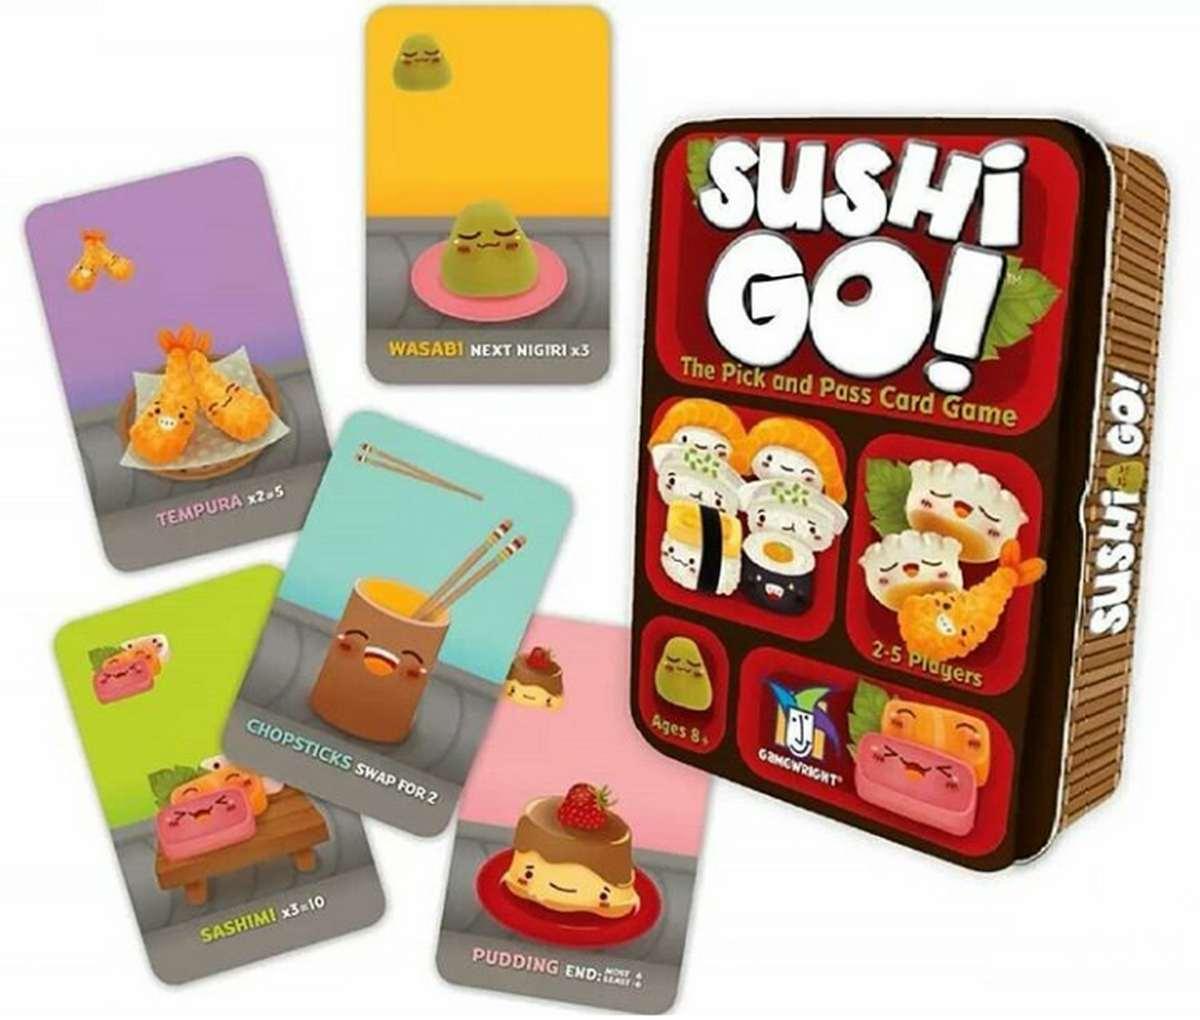 sushi-go-juego-de-cartas